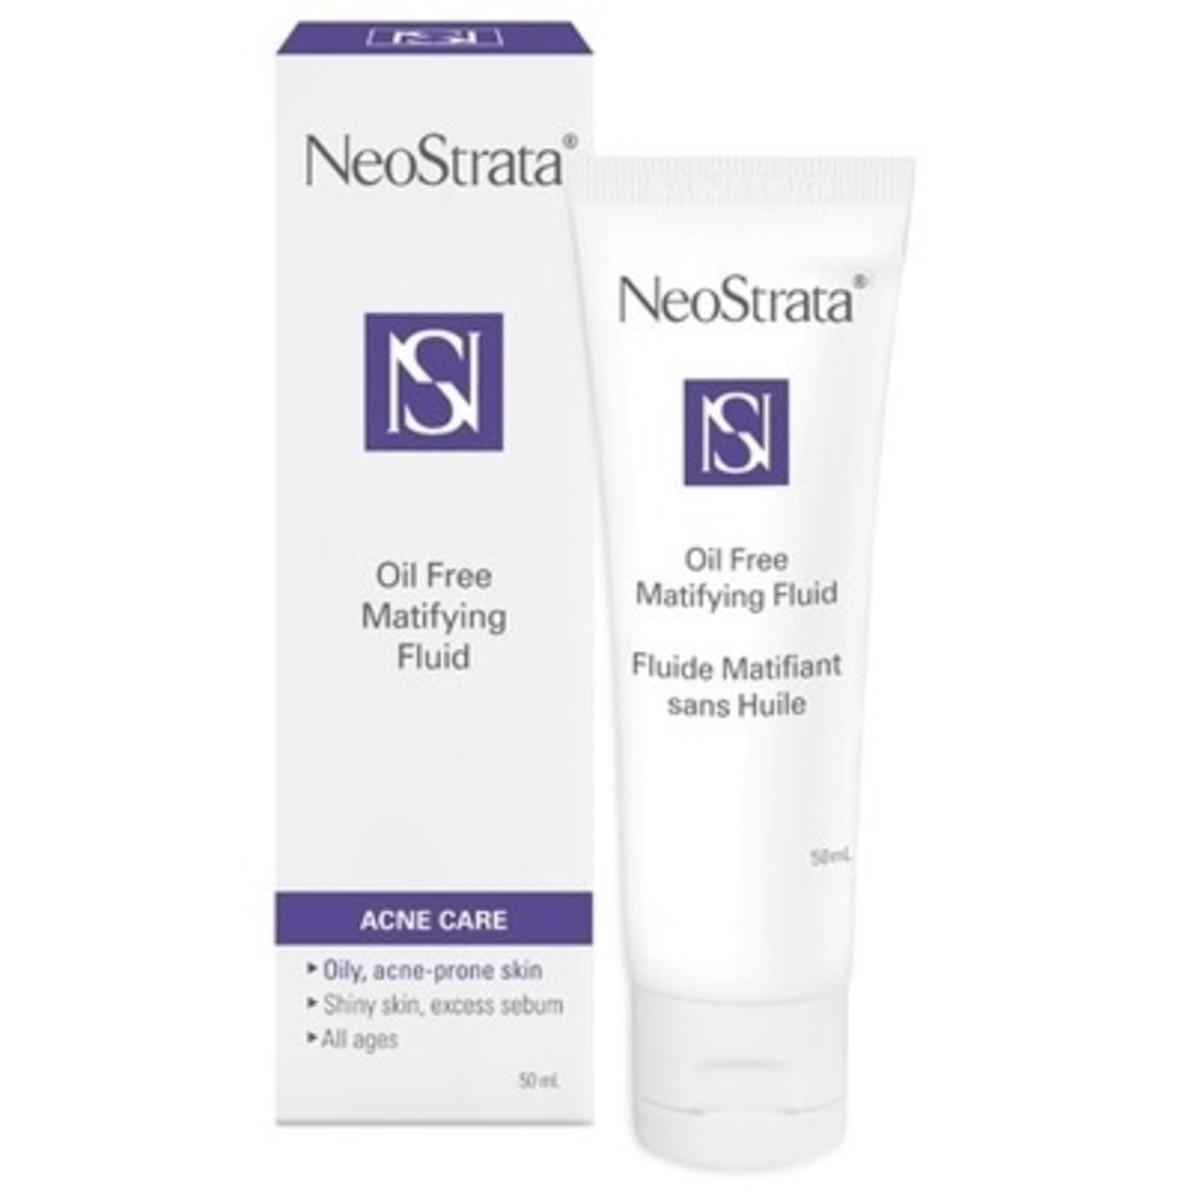 NeoStrata Oil Free Mattifying Fluid